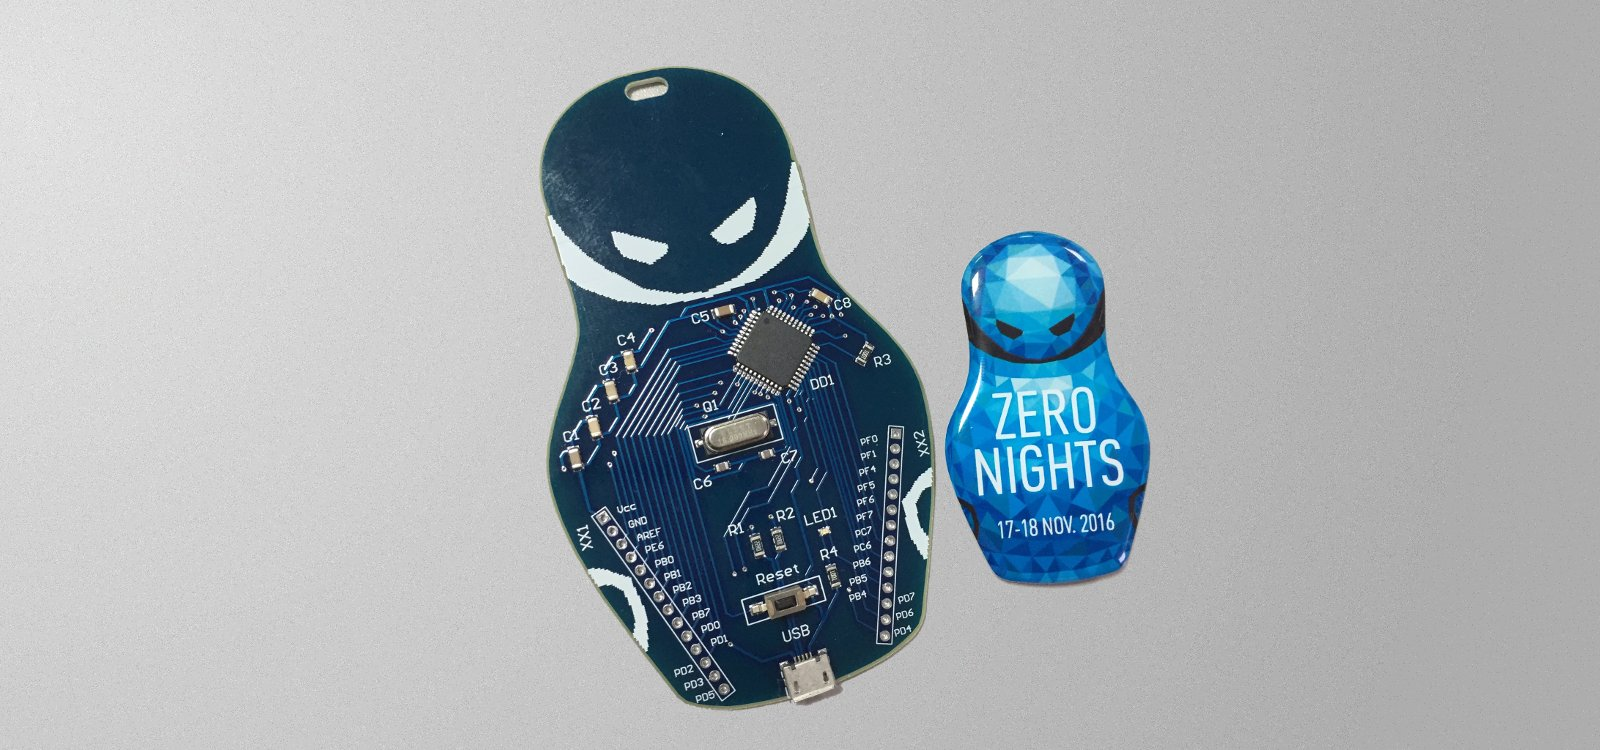 Хардварный бейджик ZeroNights 2016. Как мы делали знаменитую матрешку